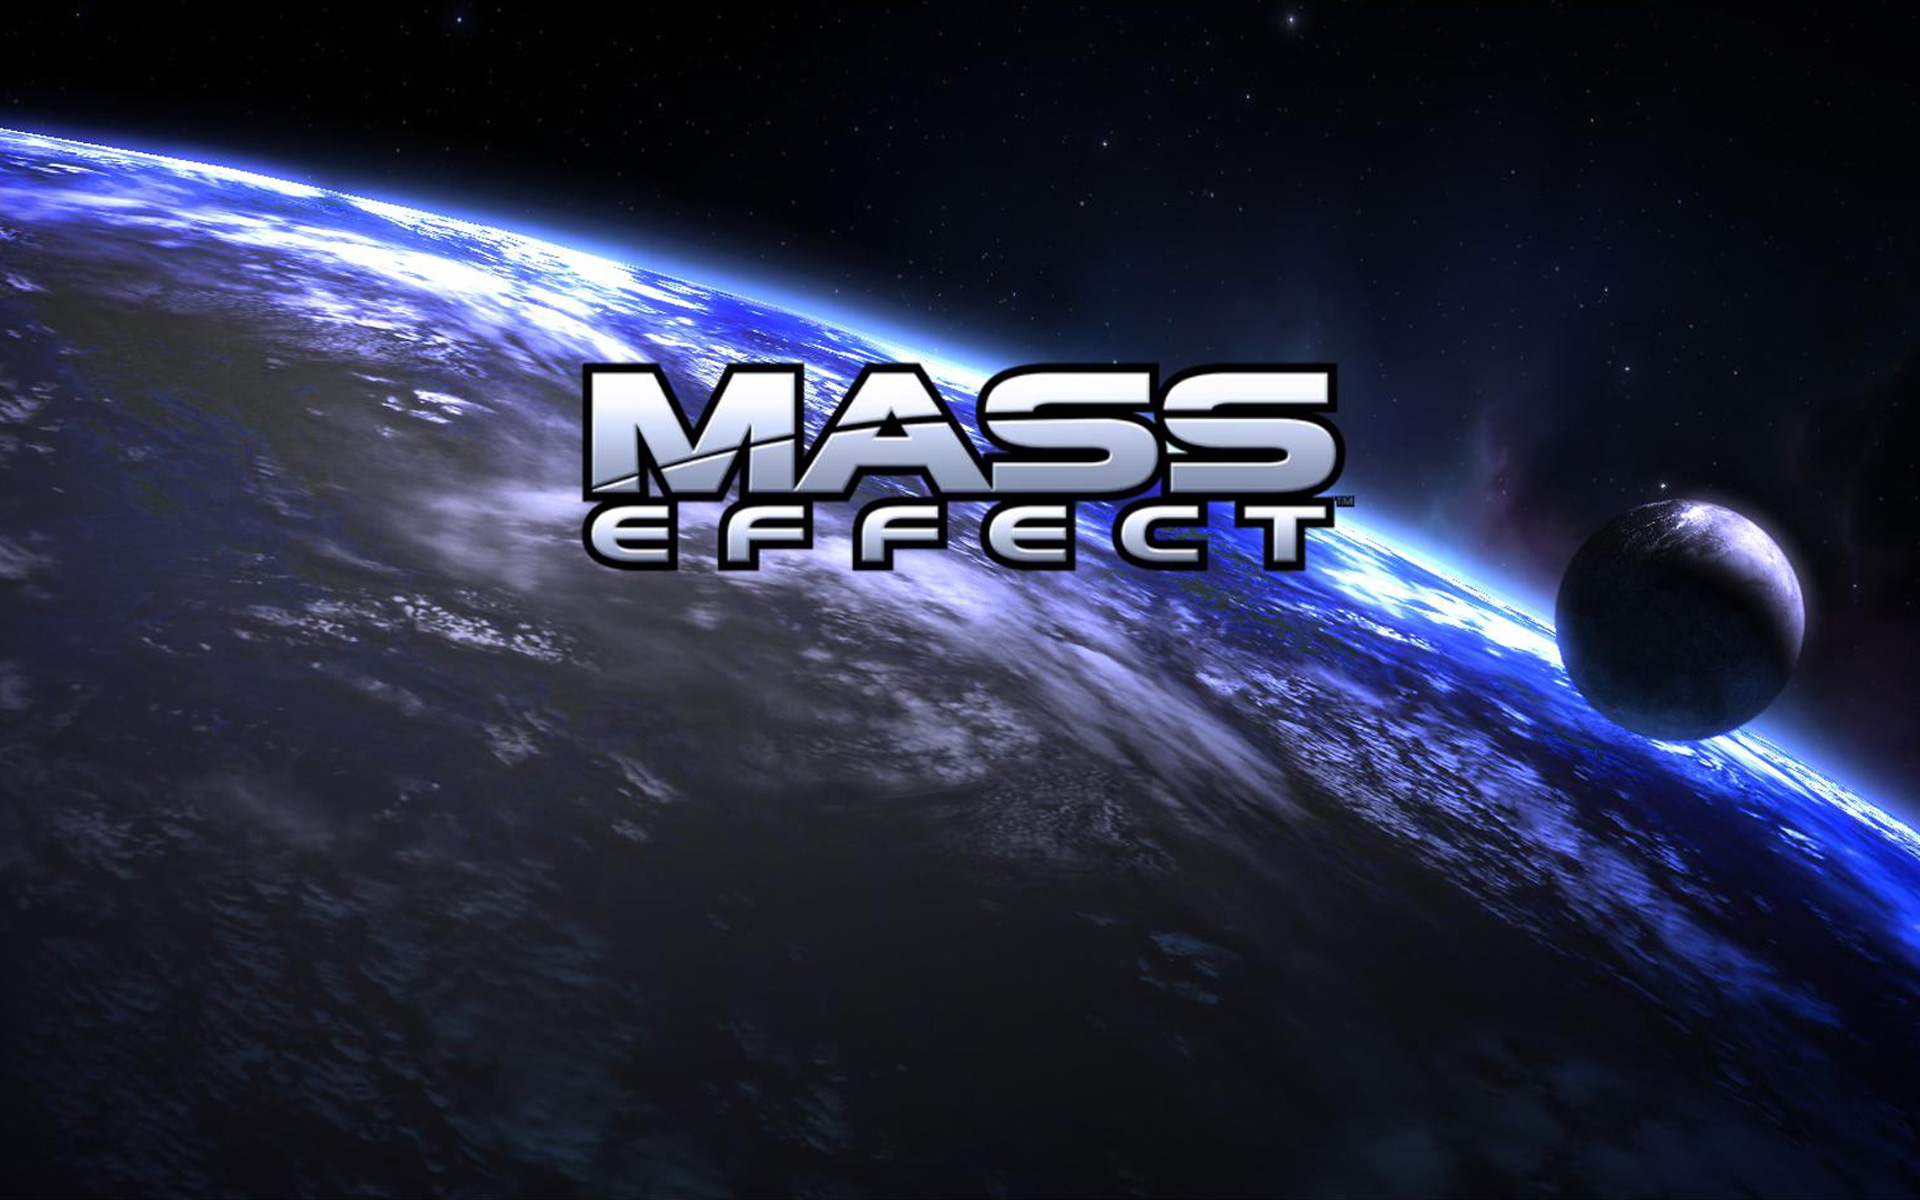 Free Mass Effect Wallpaper in 1920x1200